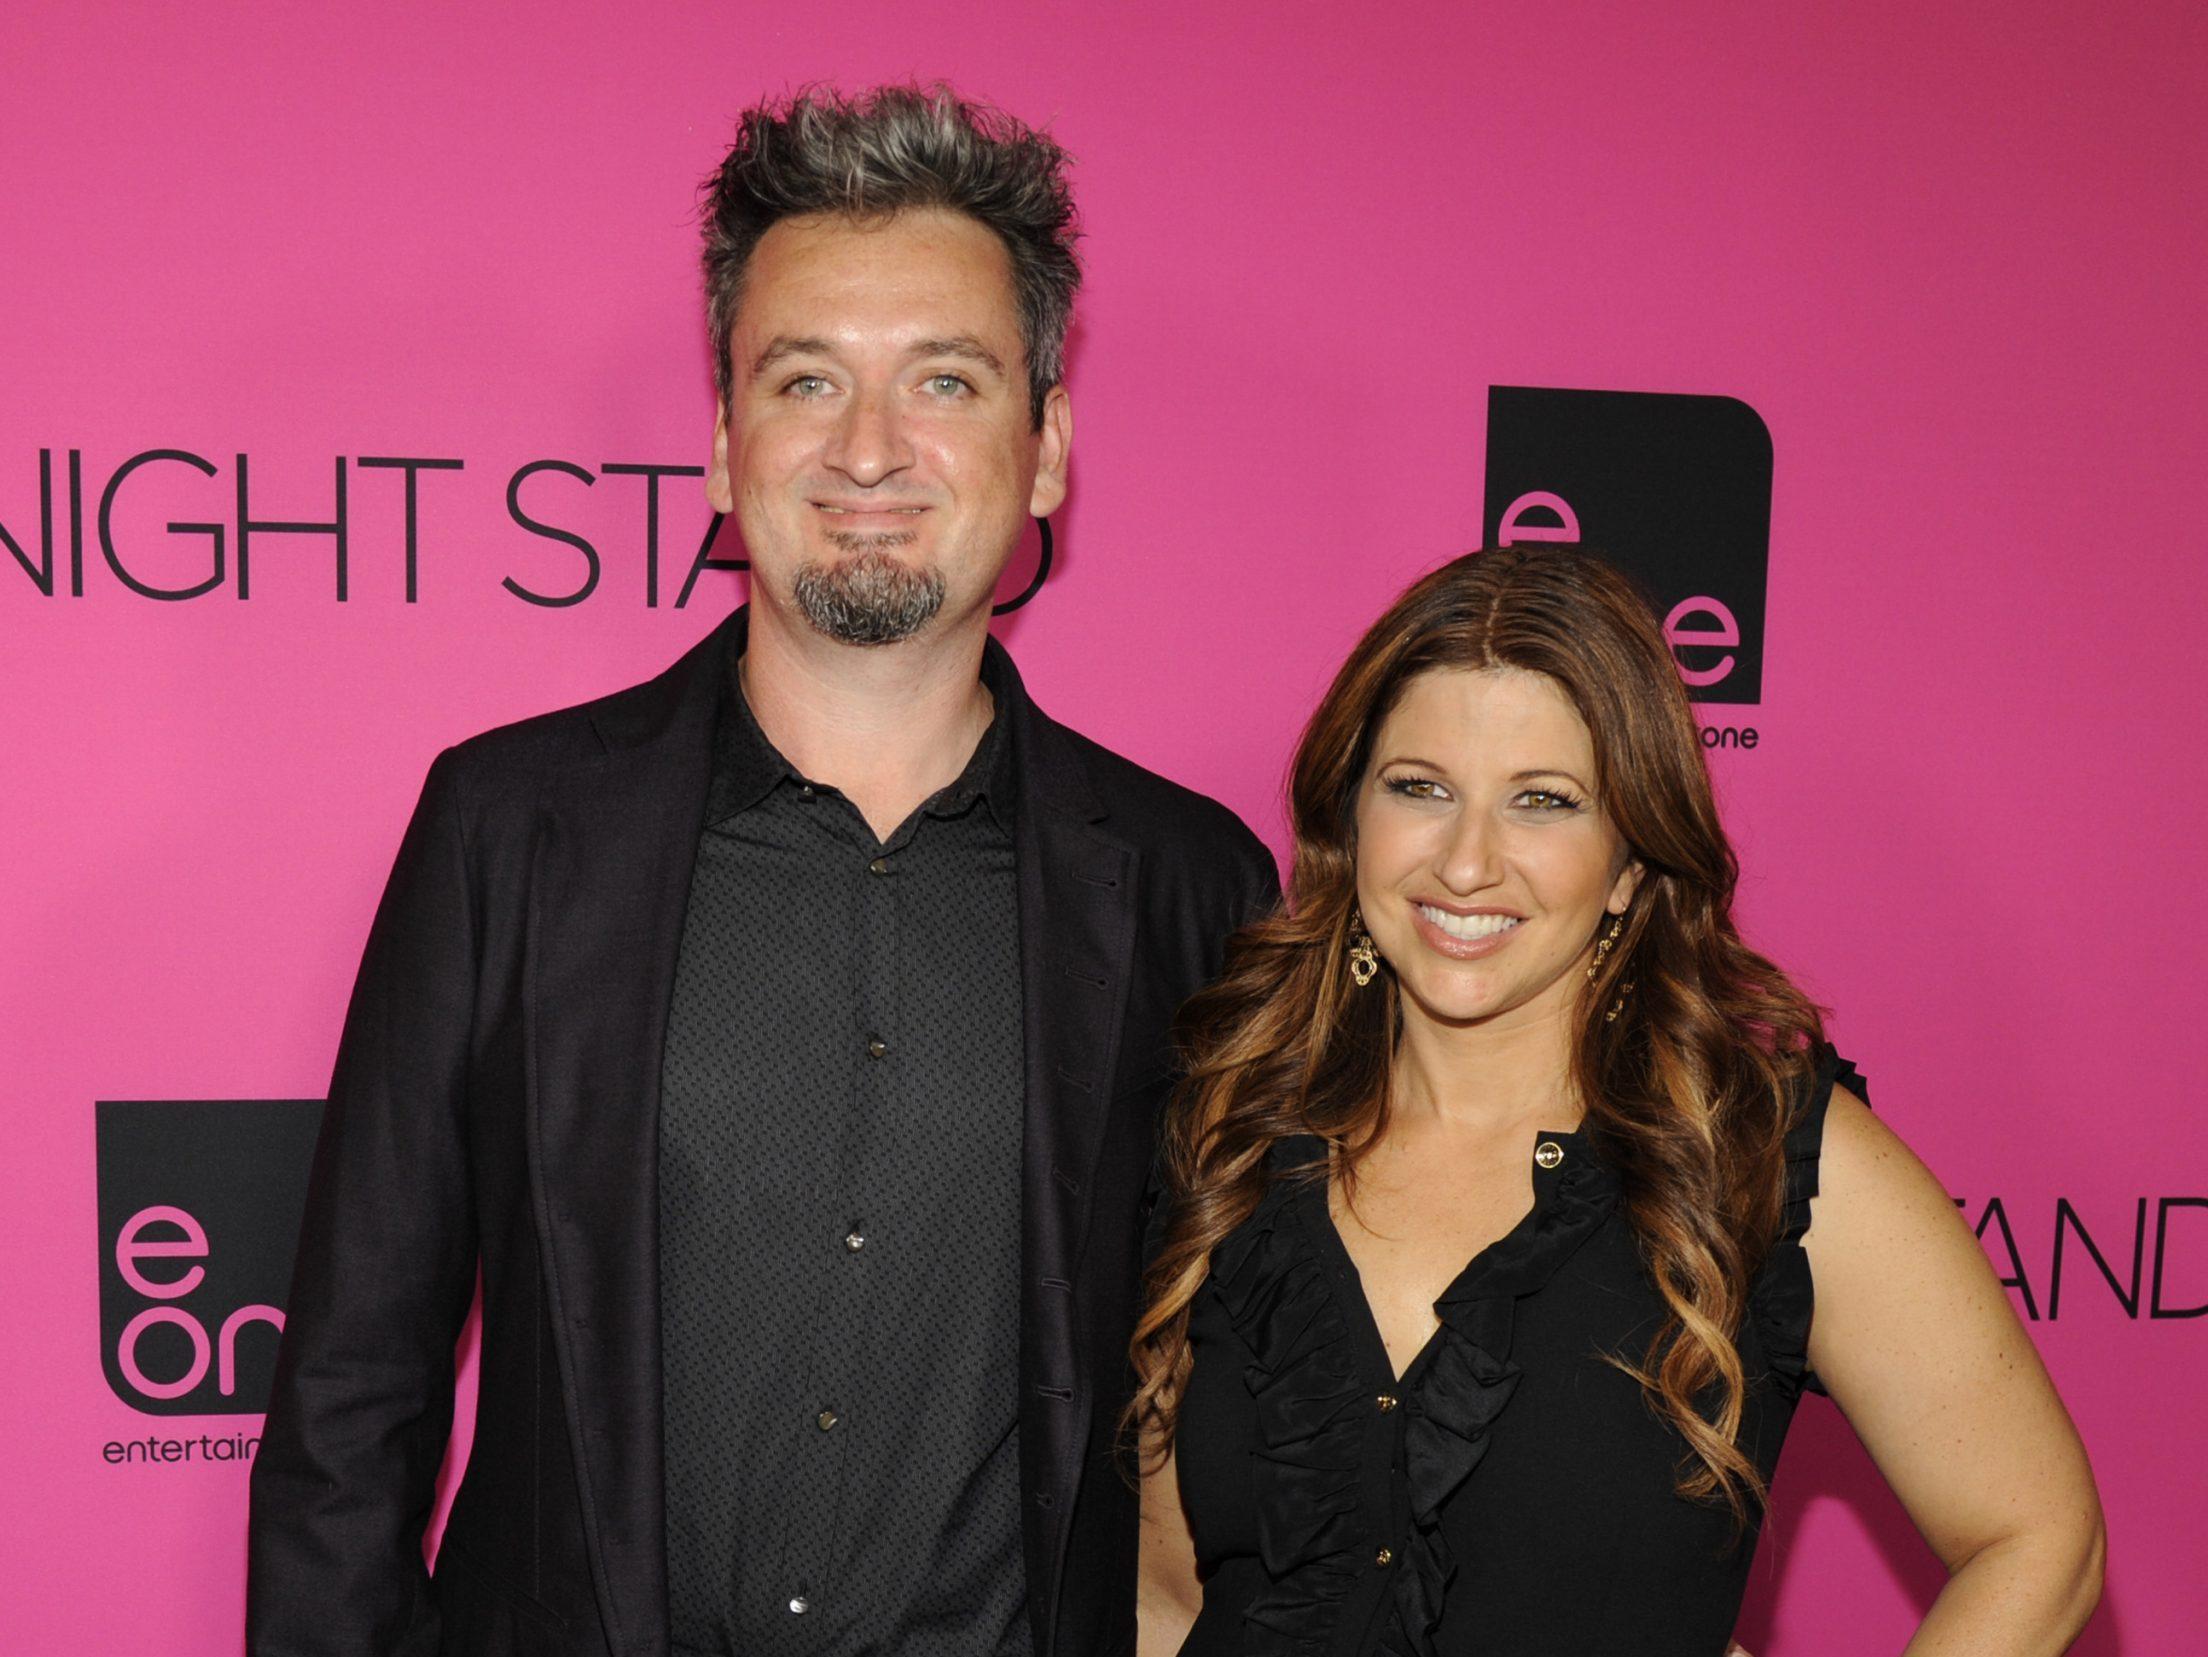 Rachel Nichols with husband Max Nichols